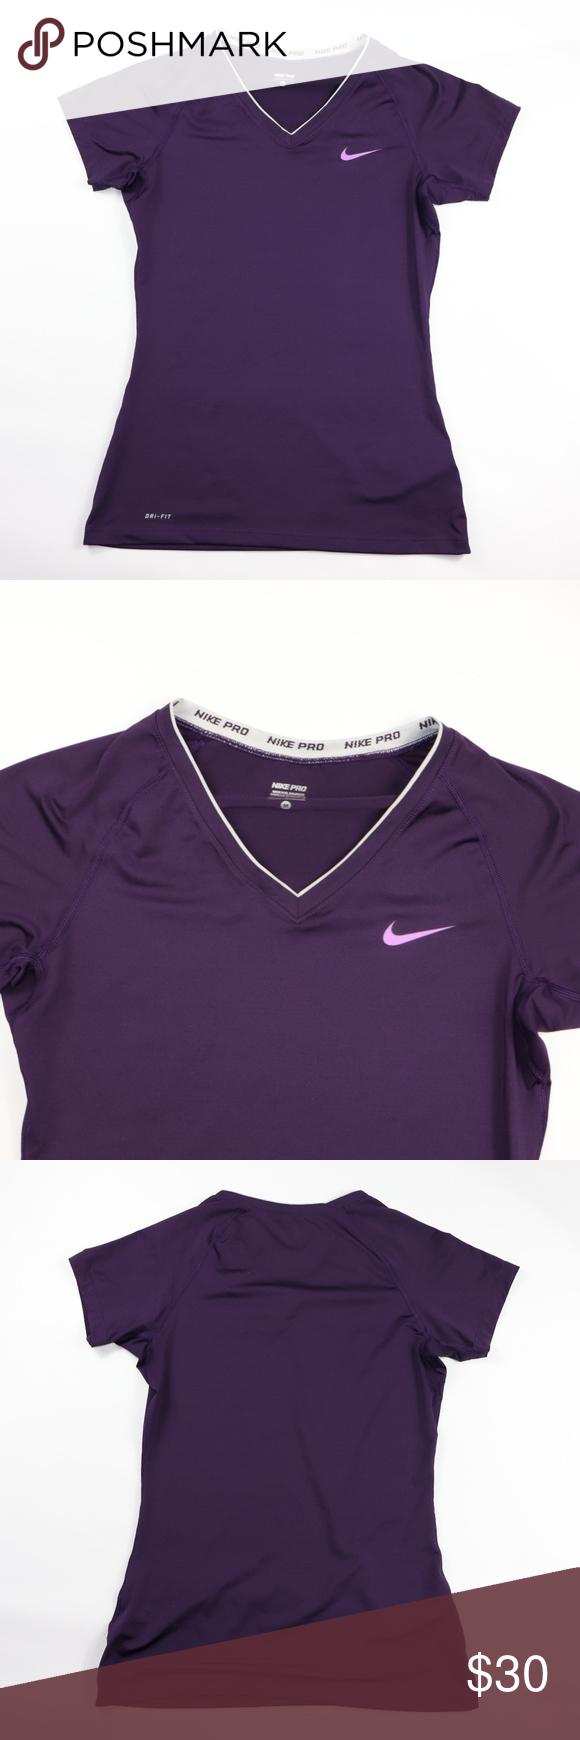 2d37ec22033 Nike Pro Dri Fit SS V Neck Running Training Shirt Women's NIKE Pro Dri Fit  Short